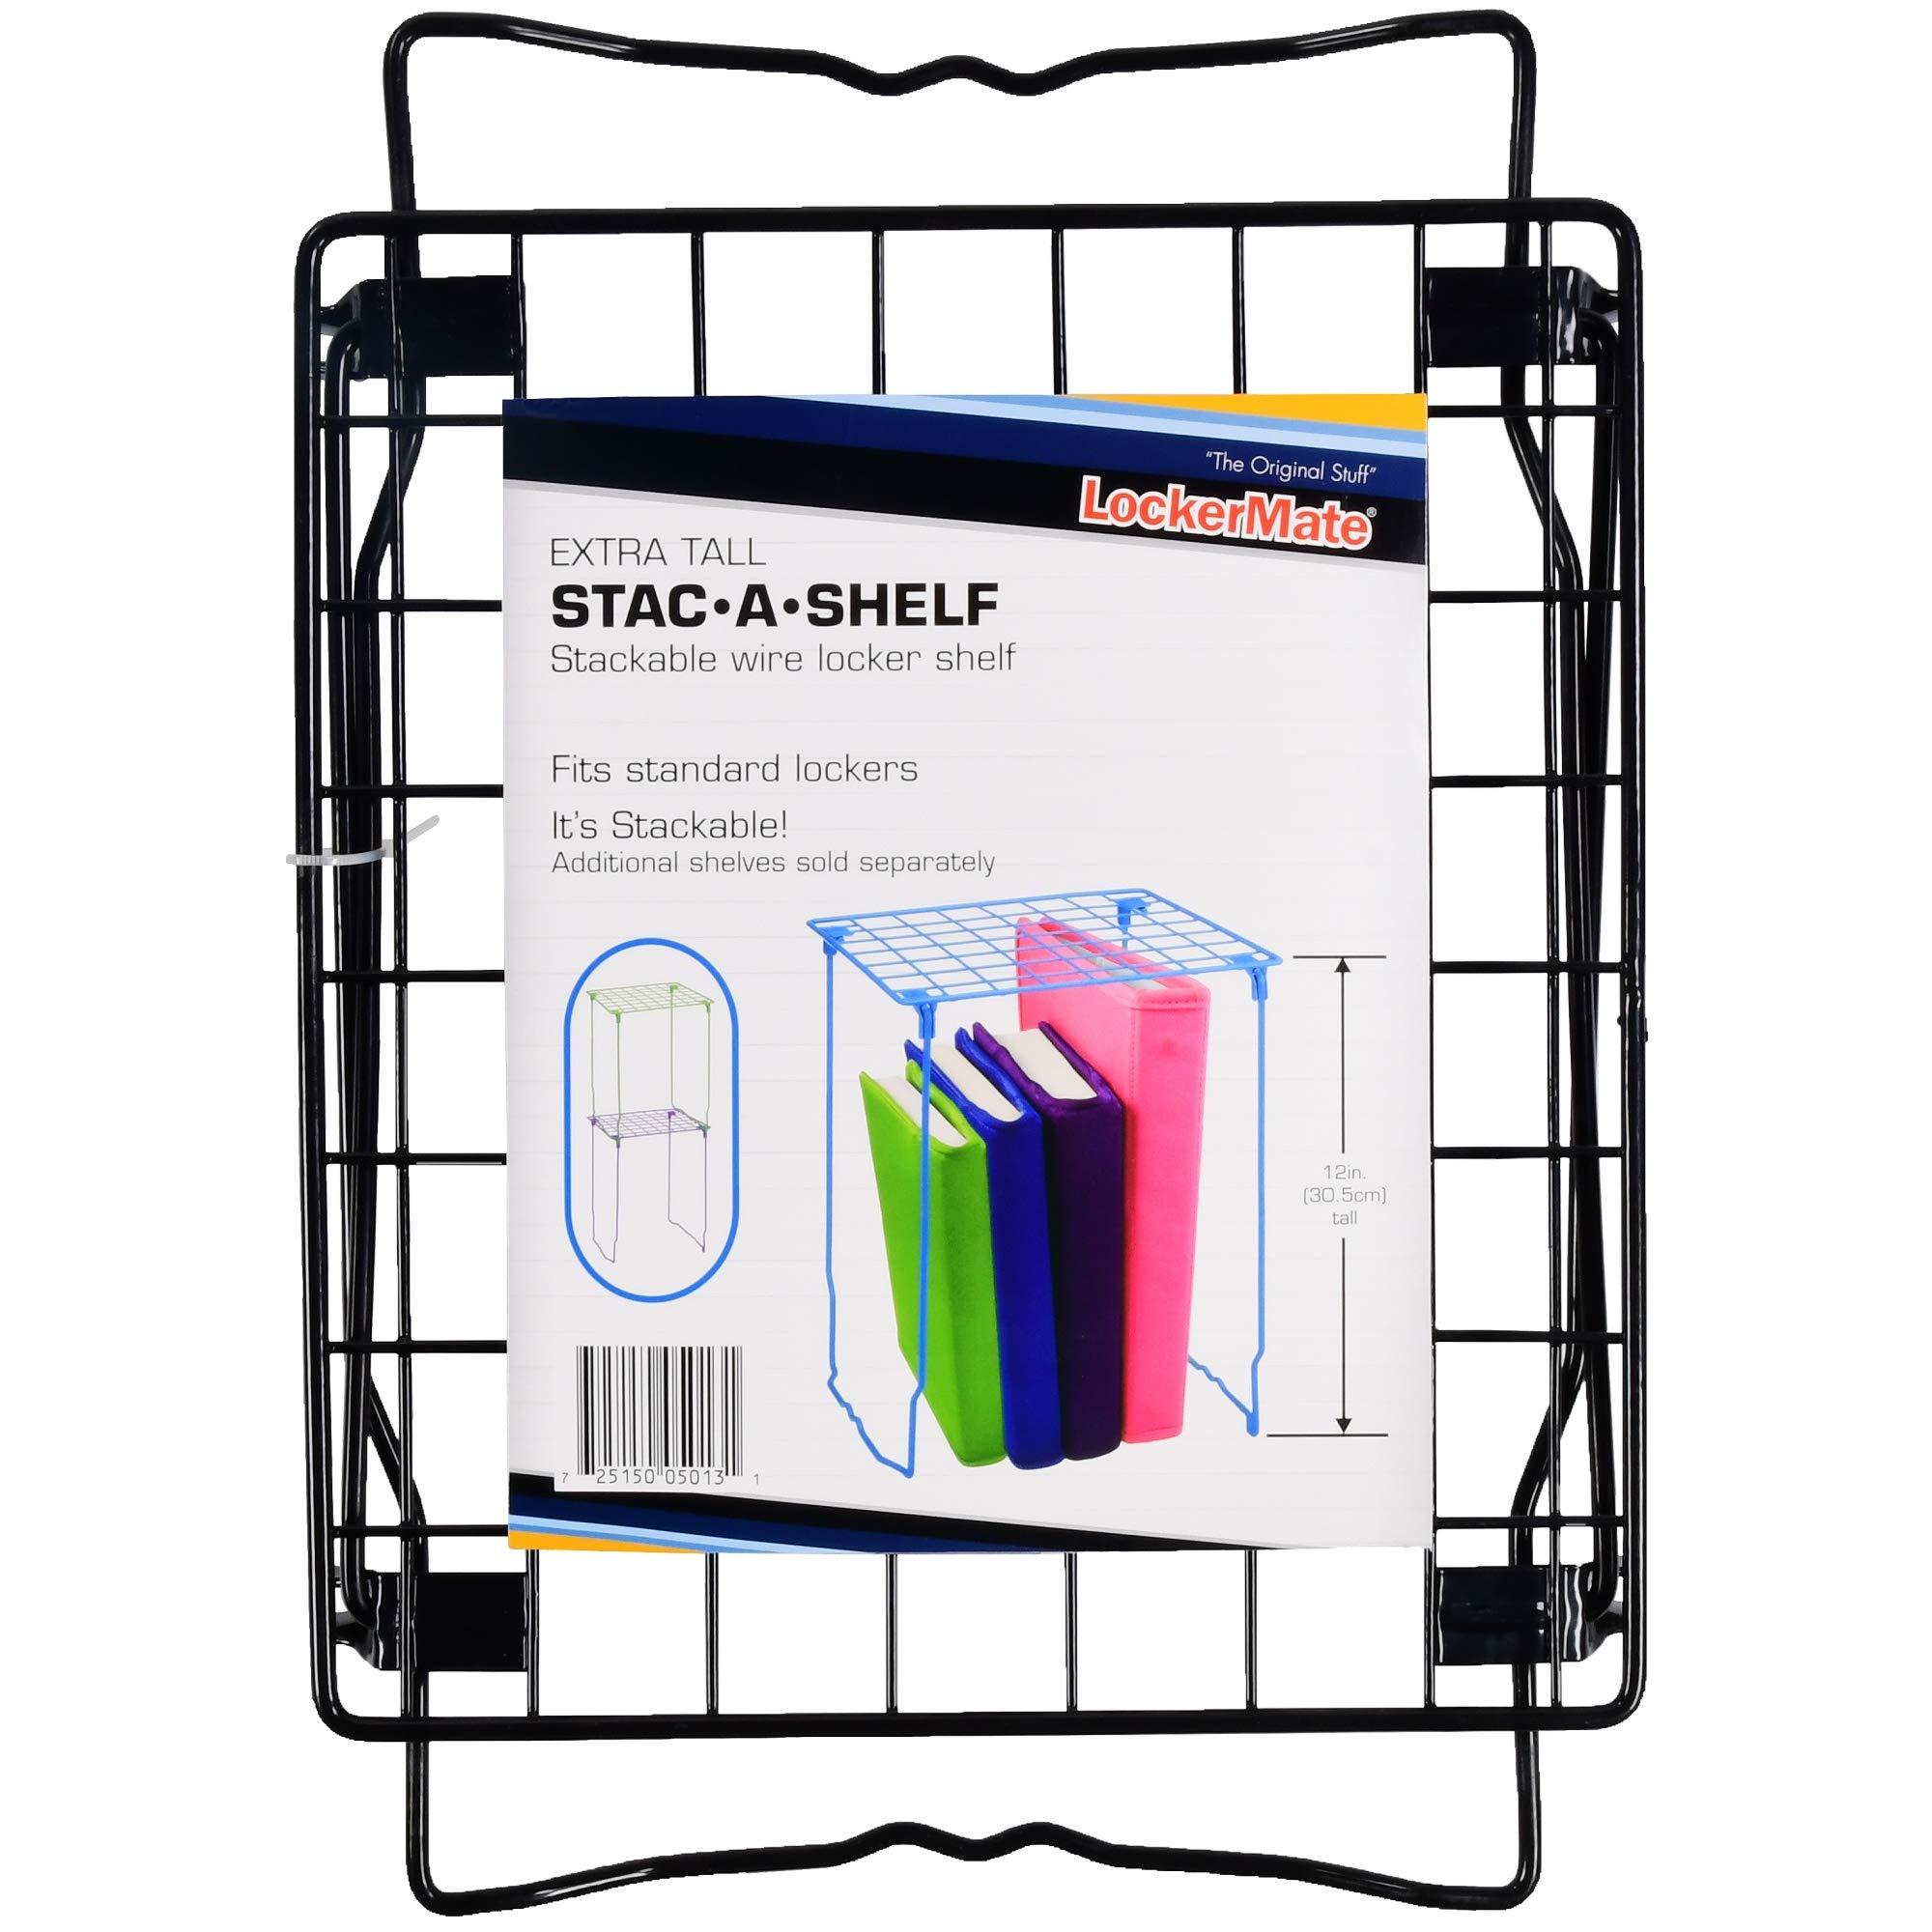 LockerMate Wire Stac-A-Shelf Stackable Wire Locker Shelf, 12 Inches, Black Color School Supplies